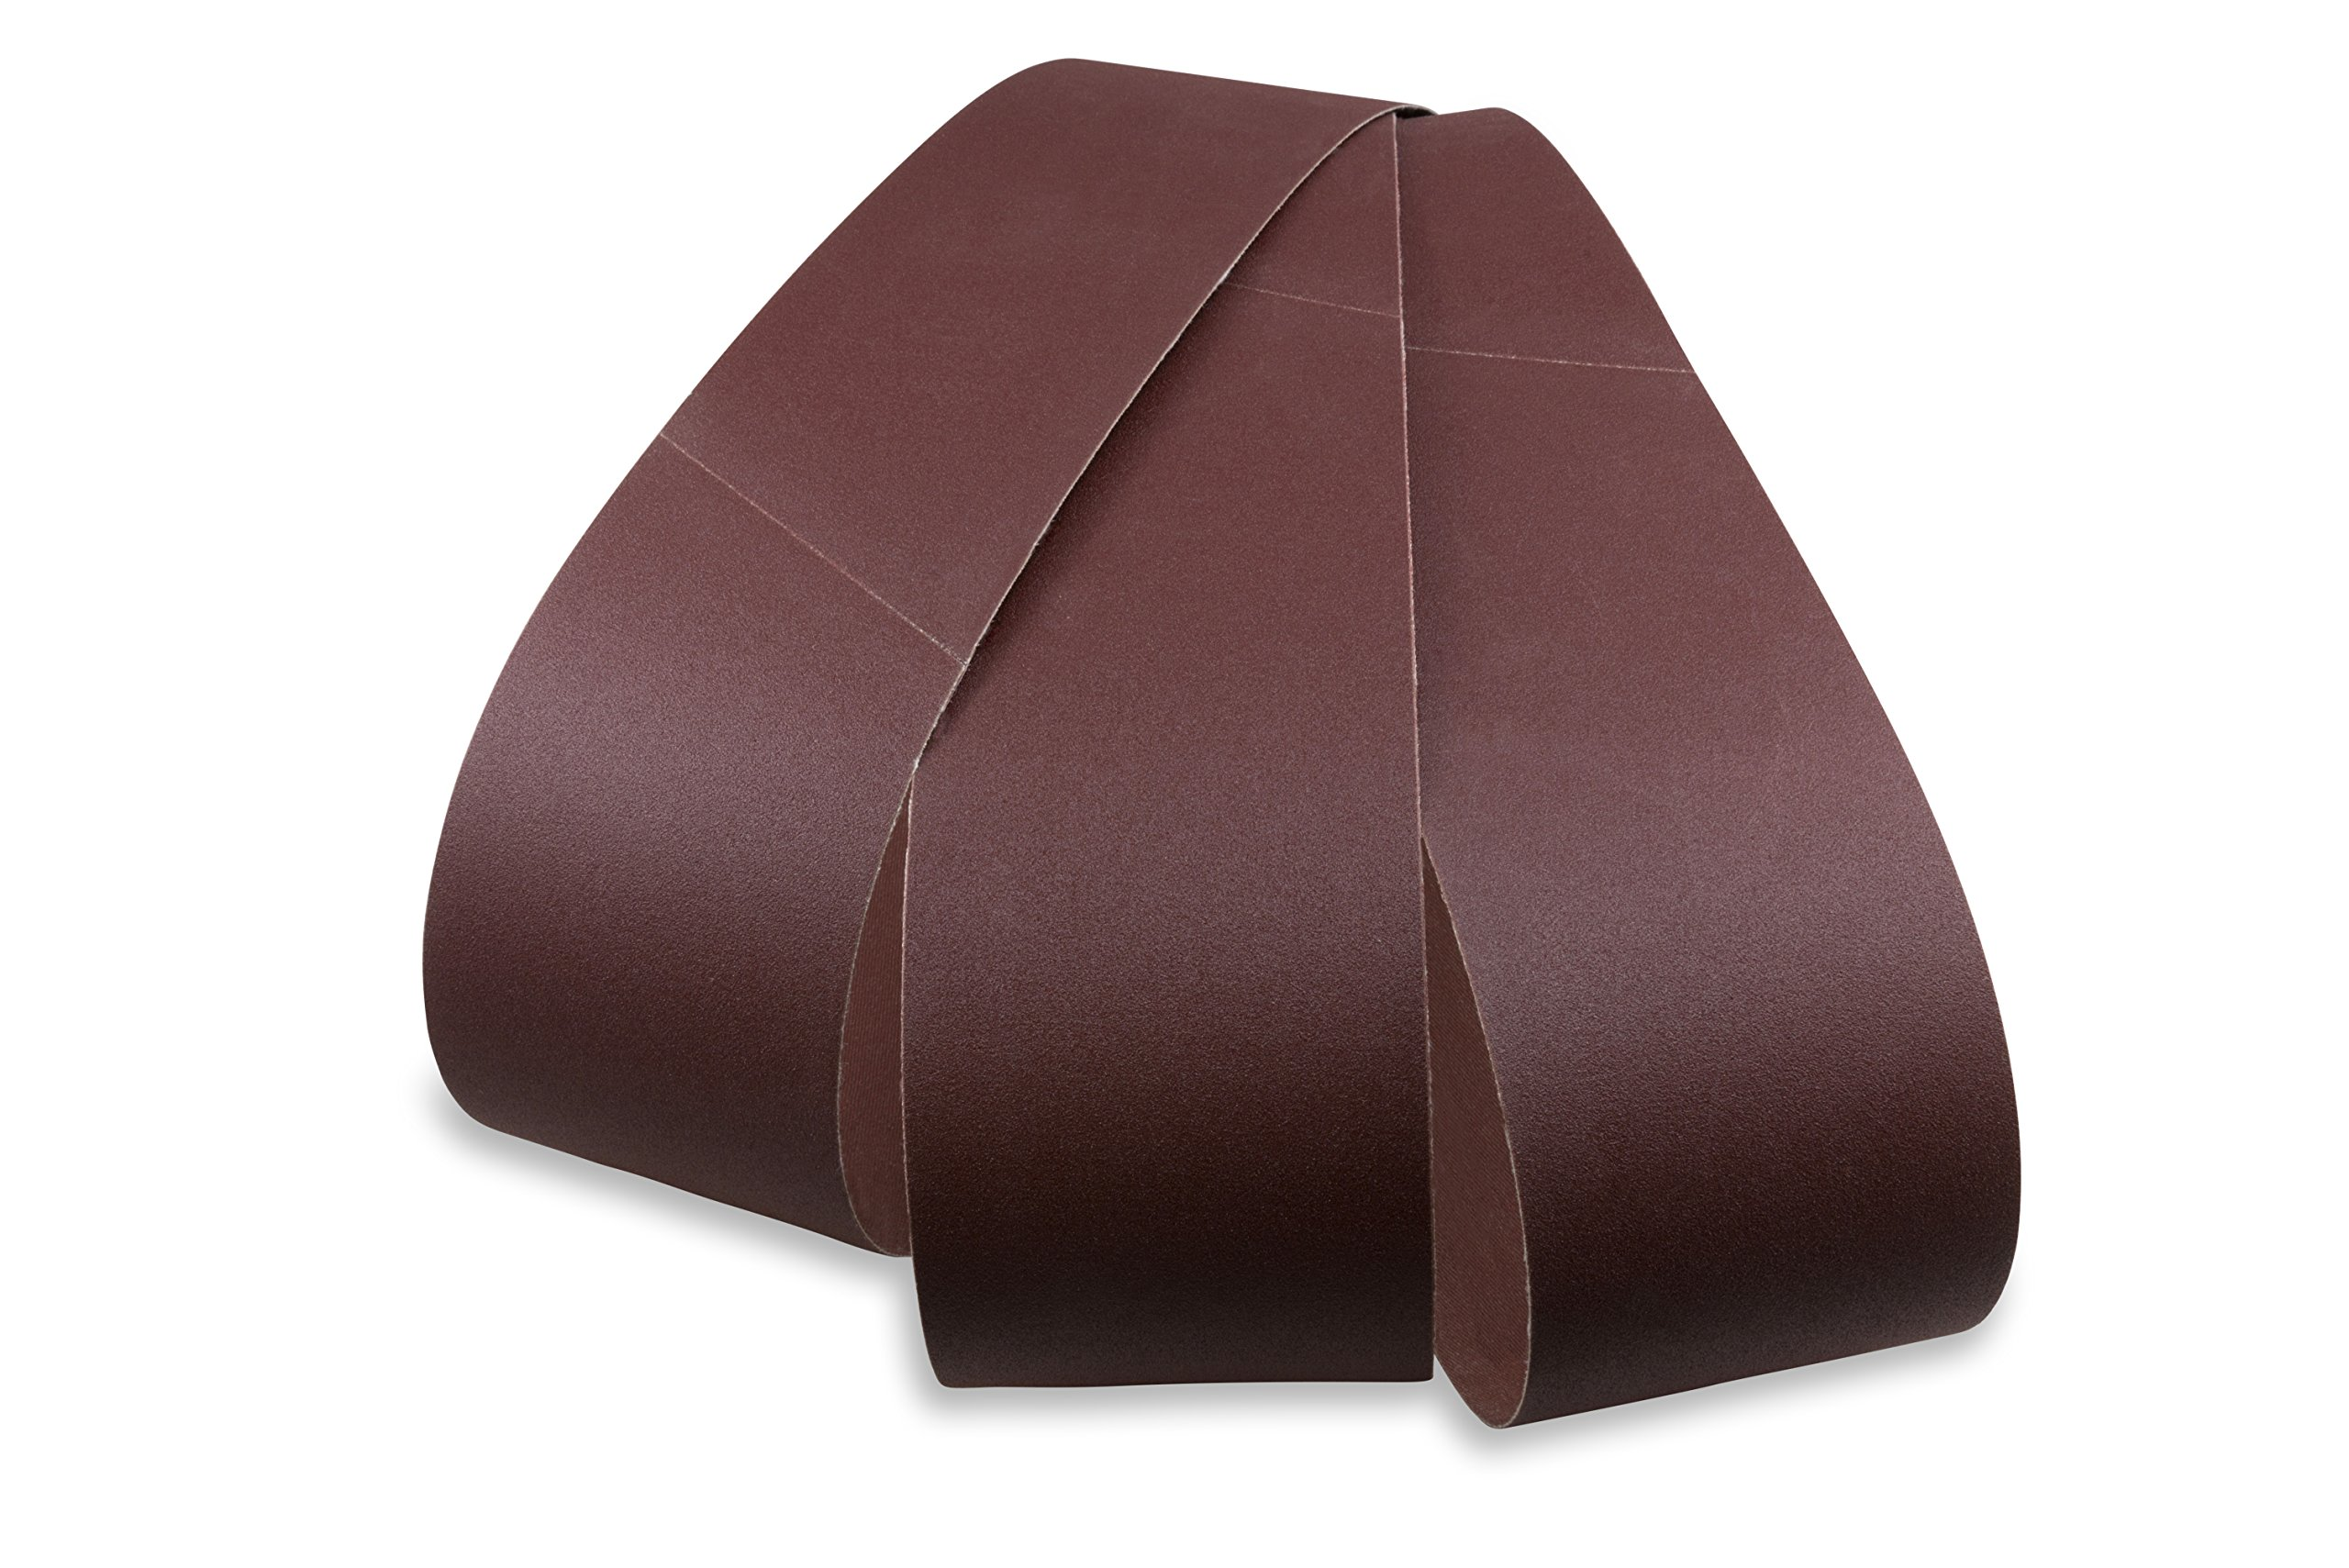 6 X 48 Inch Aluminum Oxide Premium Quality Multipurpose Sanding Belts 120, 180, 220 Grit, 3 Pack Assortment by Red Label Abrasives